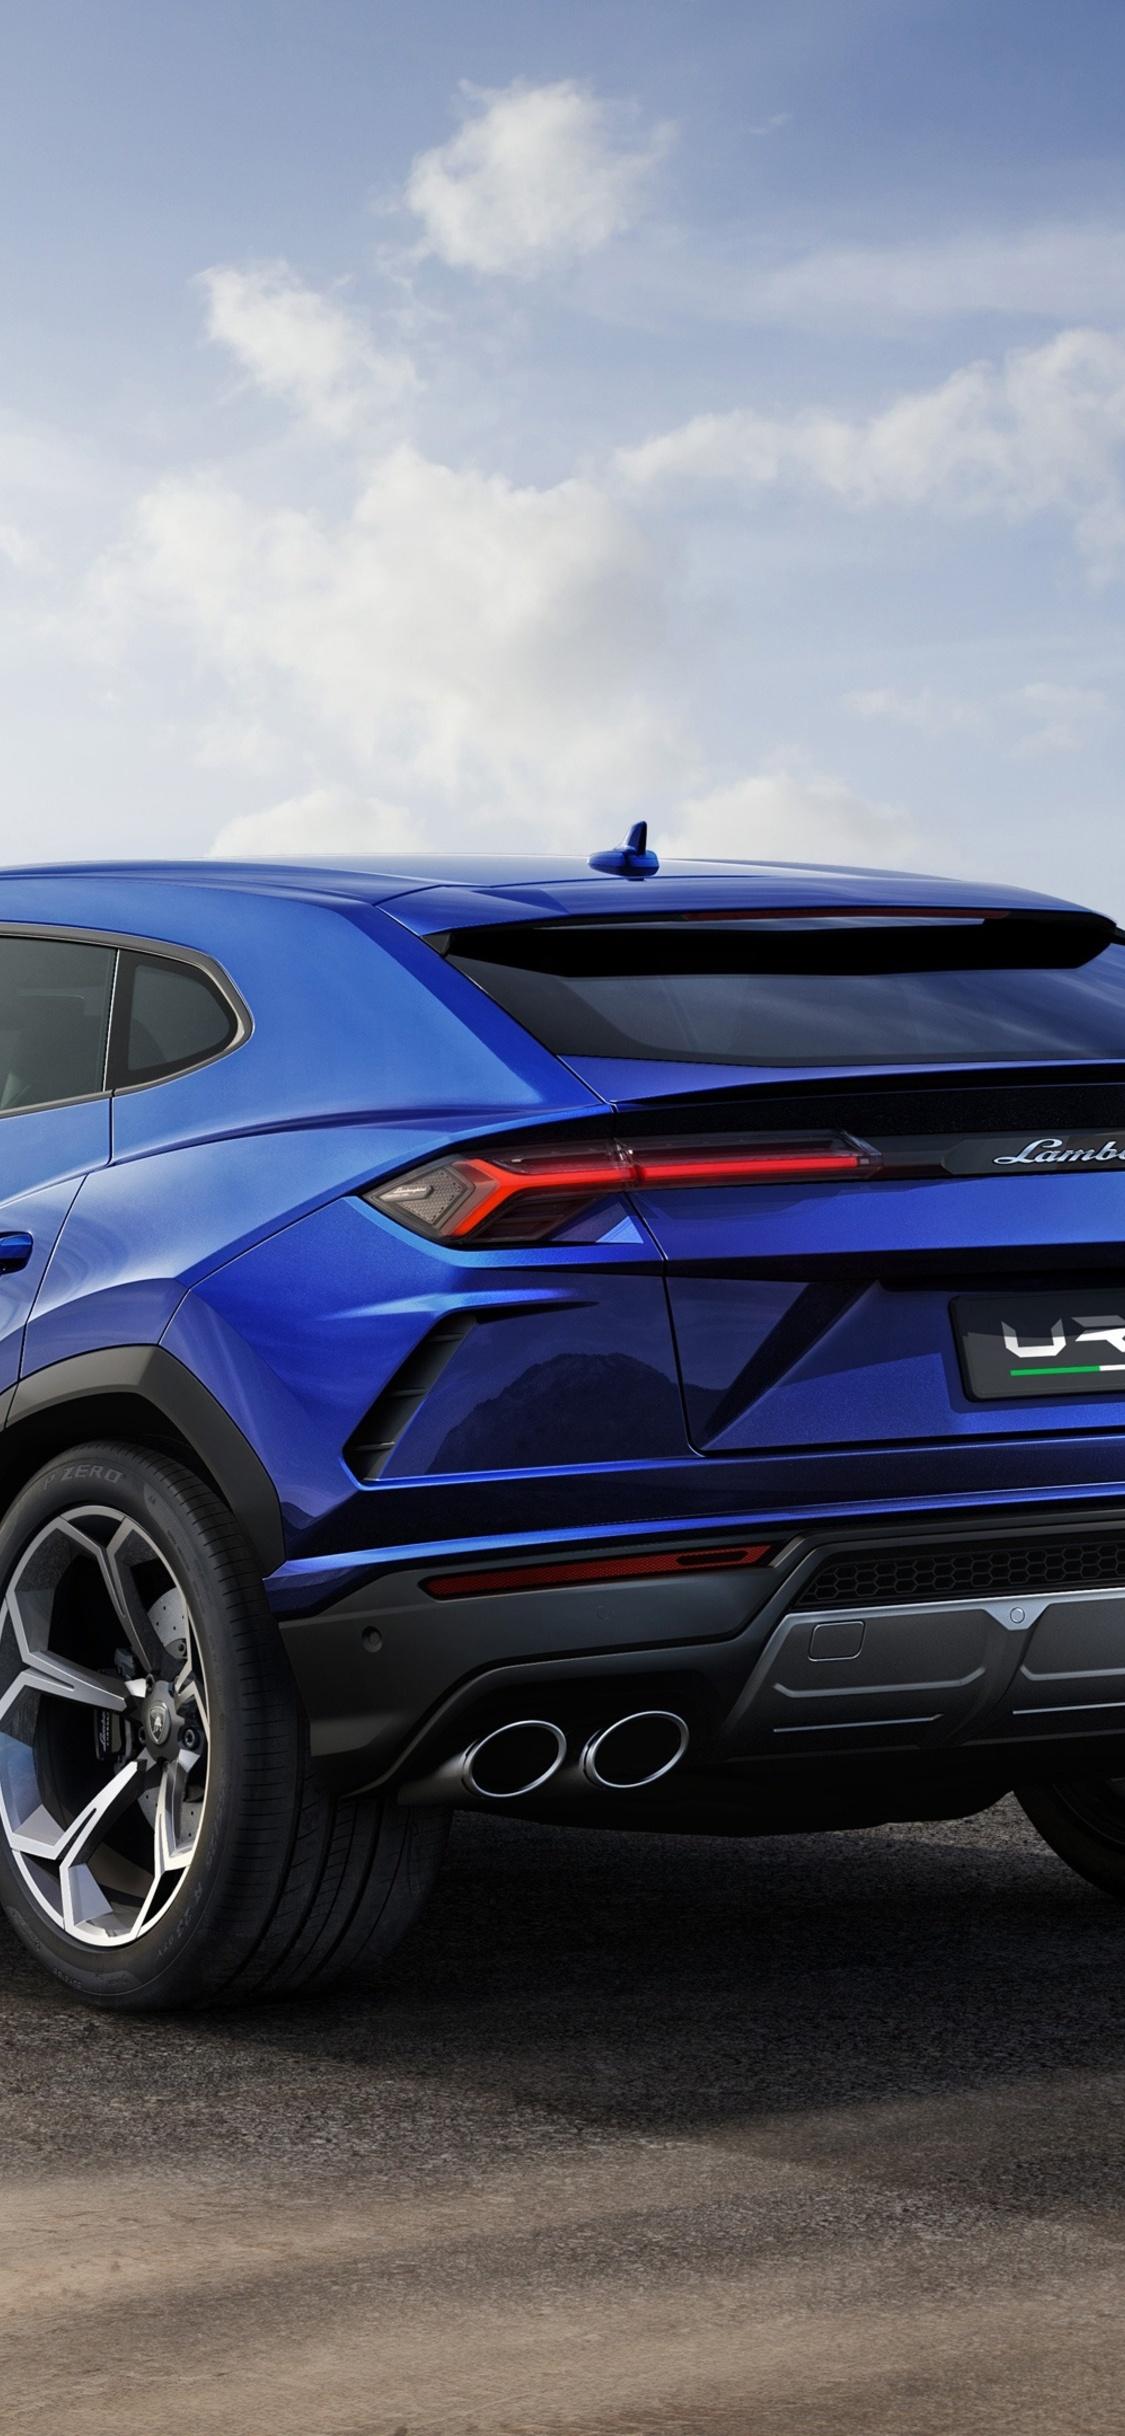 1125x2436 Lamborghini Urus Blue Color 4k Iphone Xs Iphone 10 Iphone